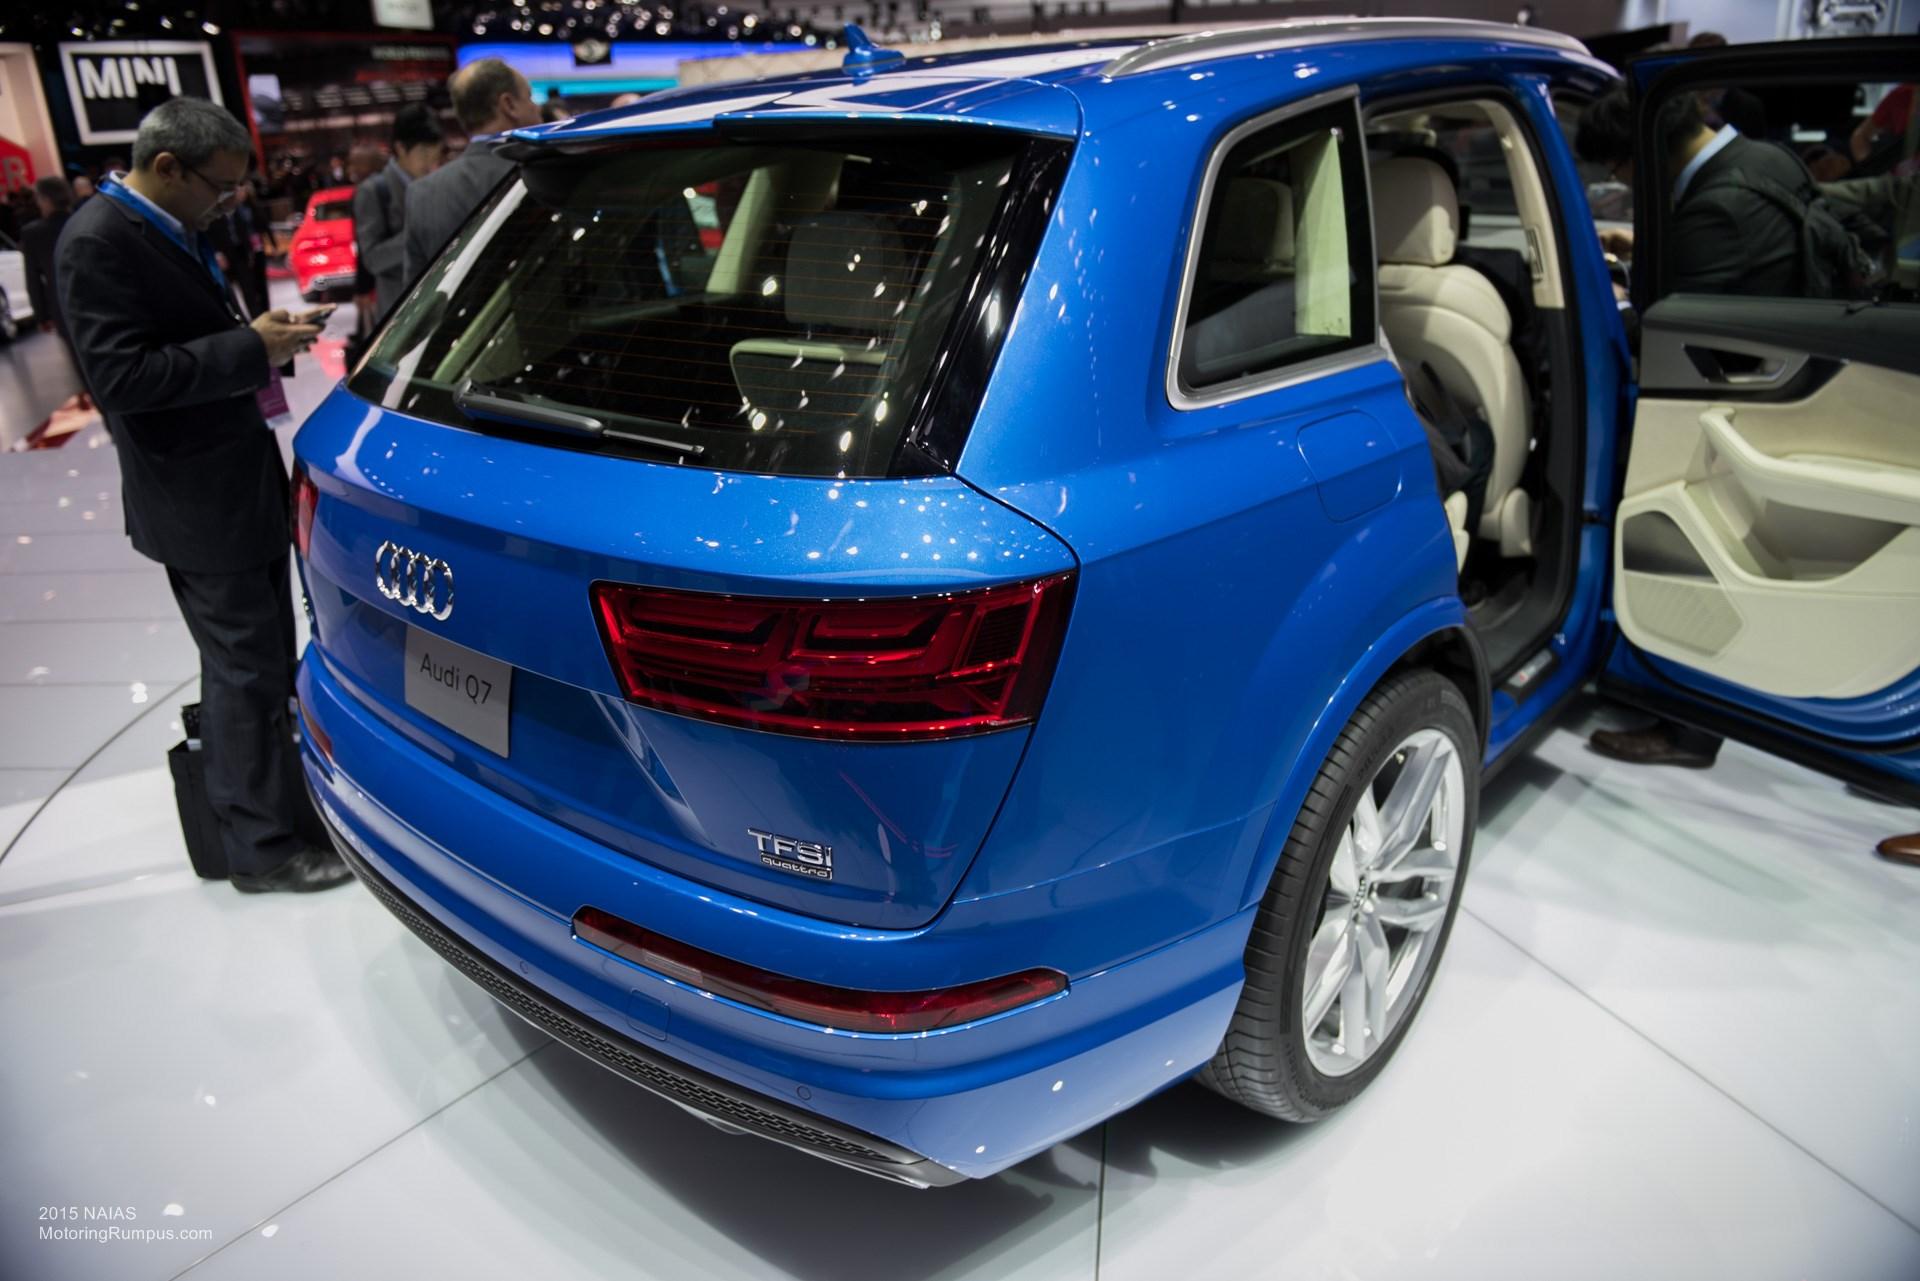 2015 NAIAS Audi Q7 Tail Lights